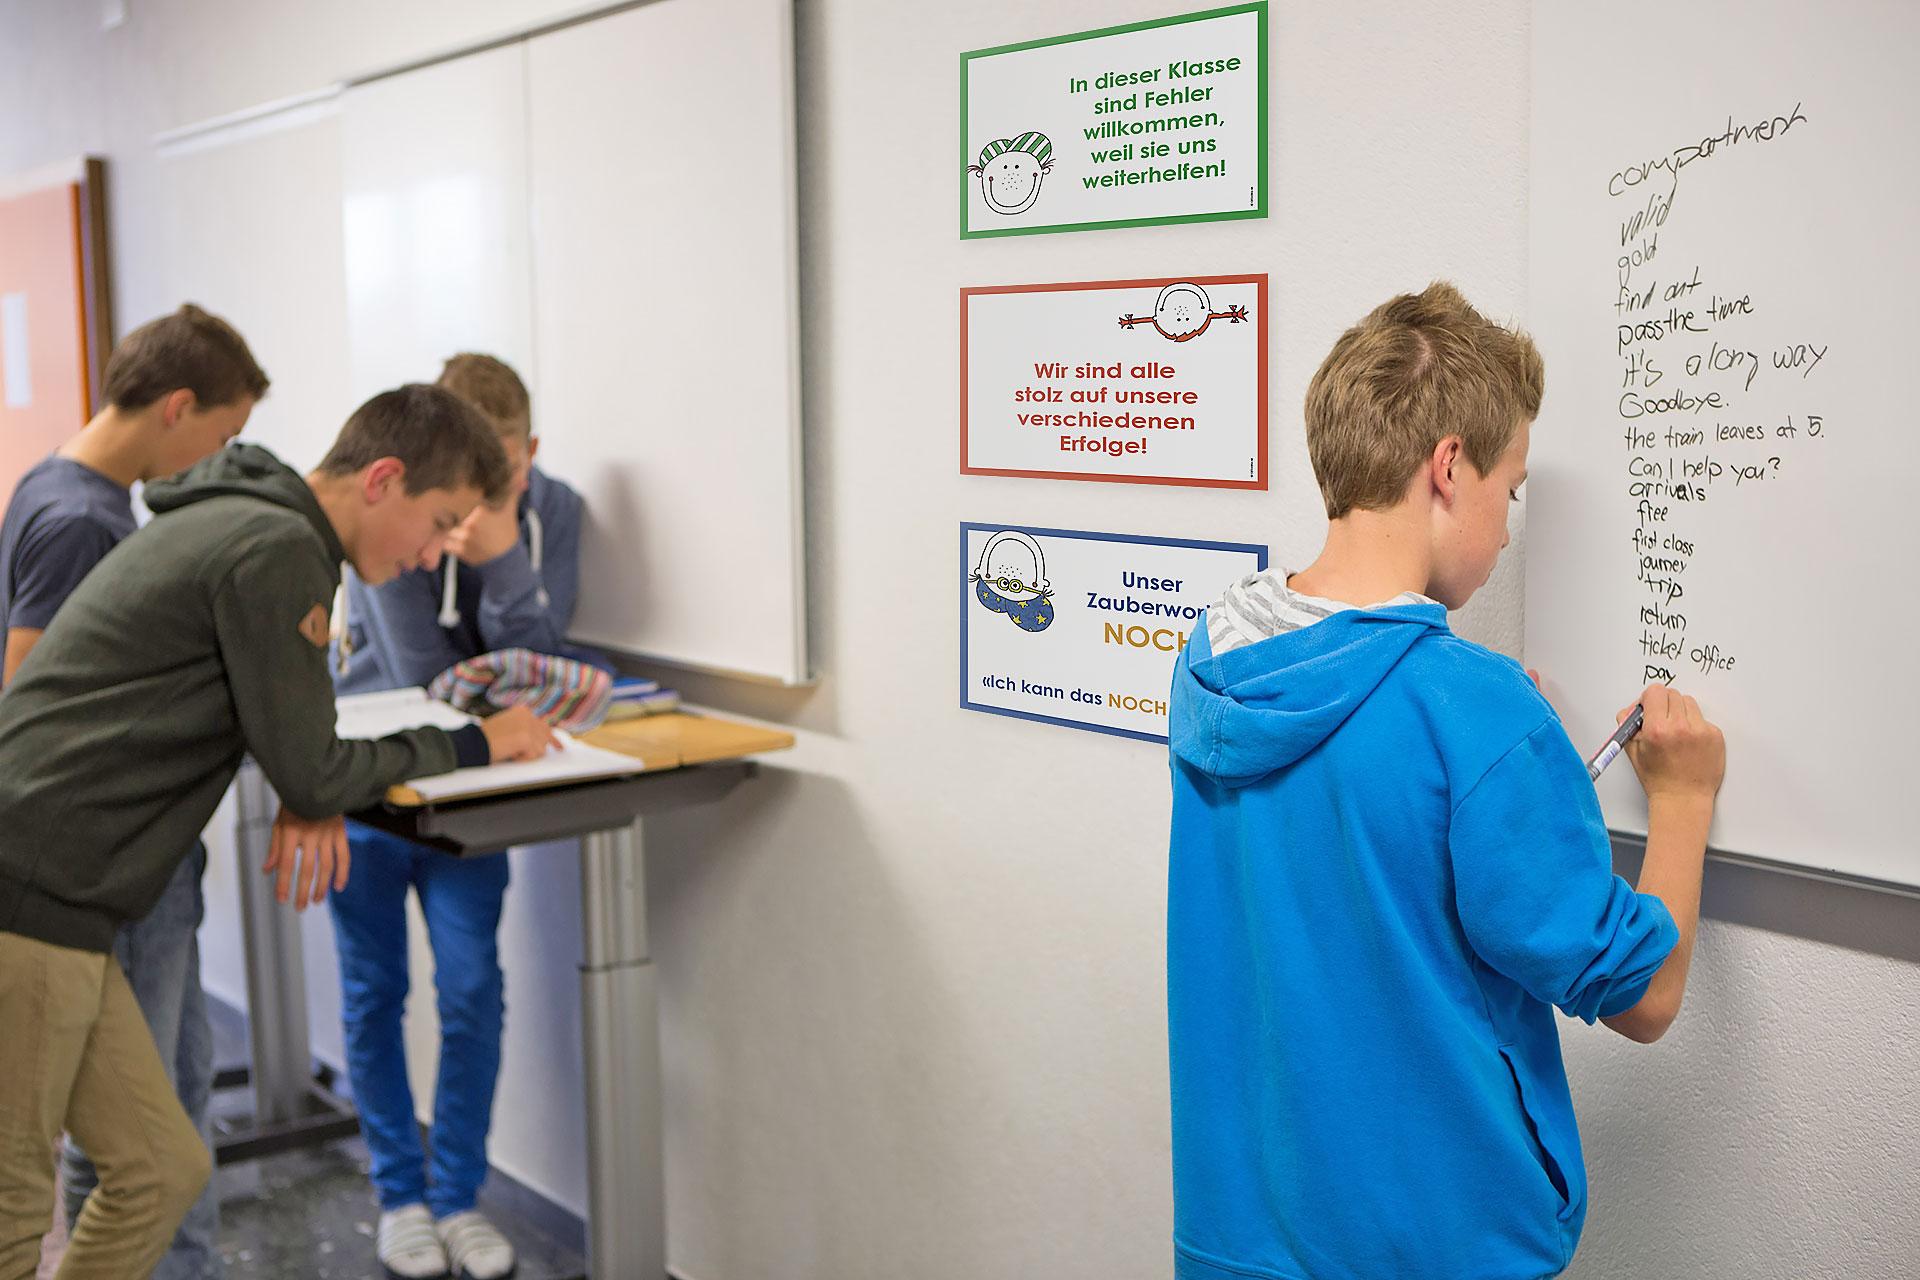 Schüler arbeitet am Whiteboard neben den Kleinplakaten Mindset